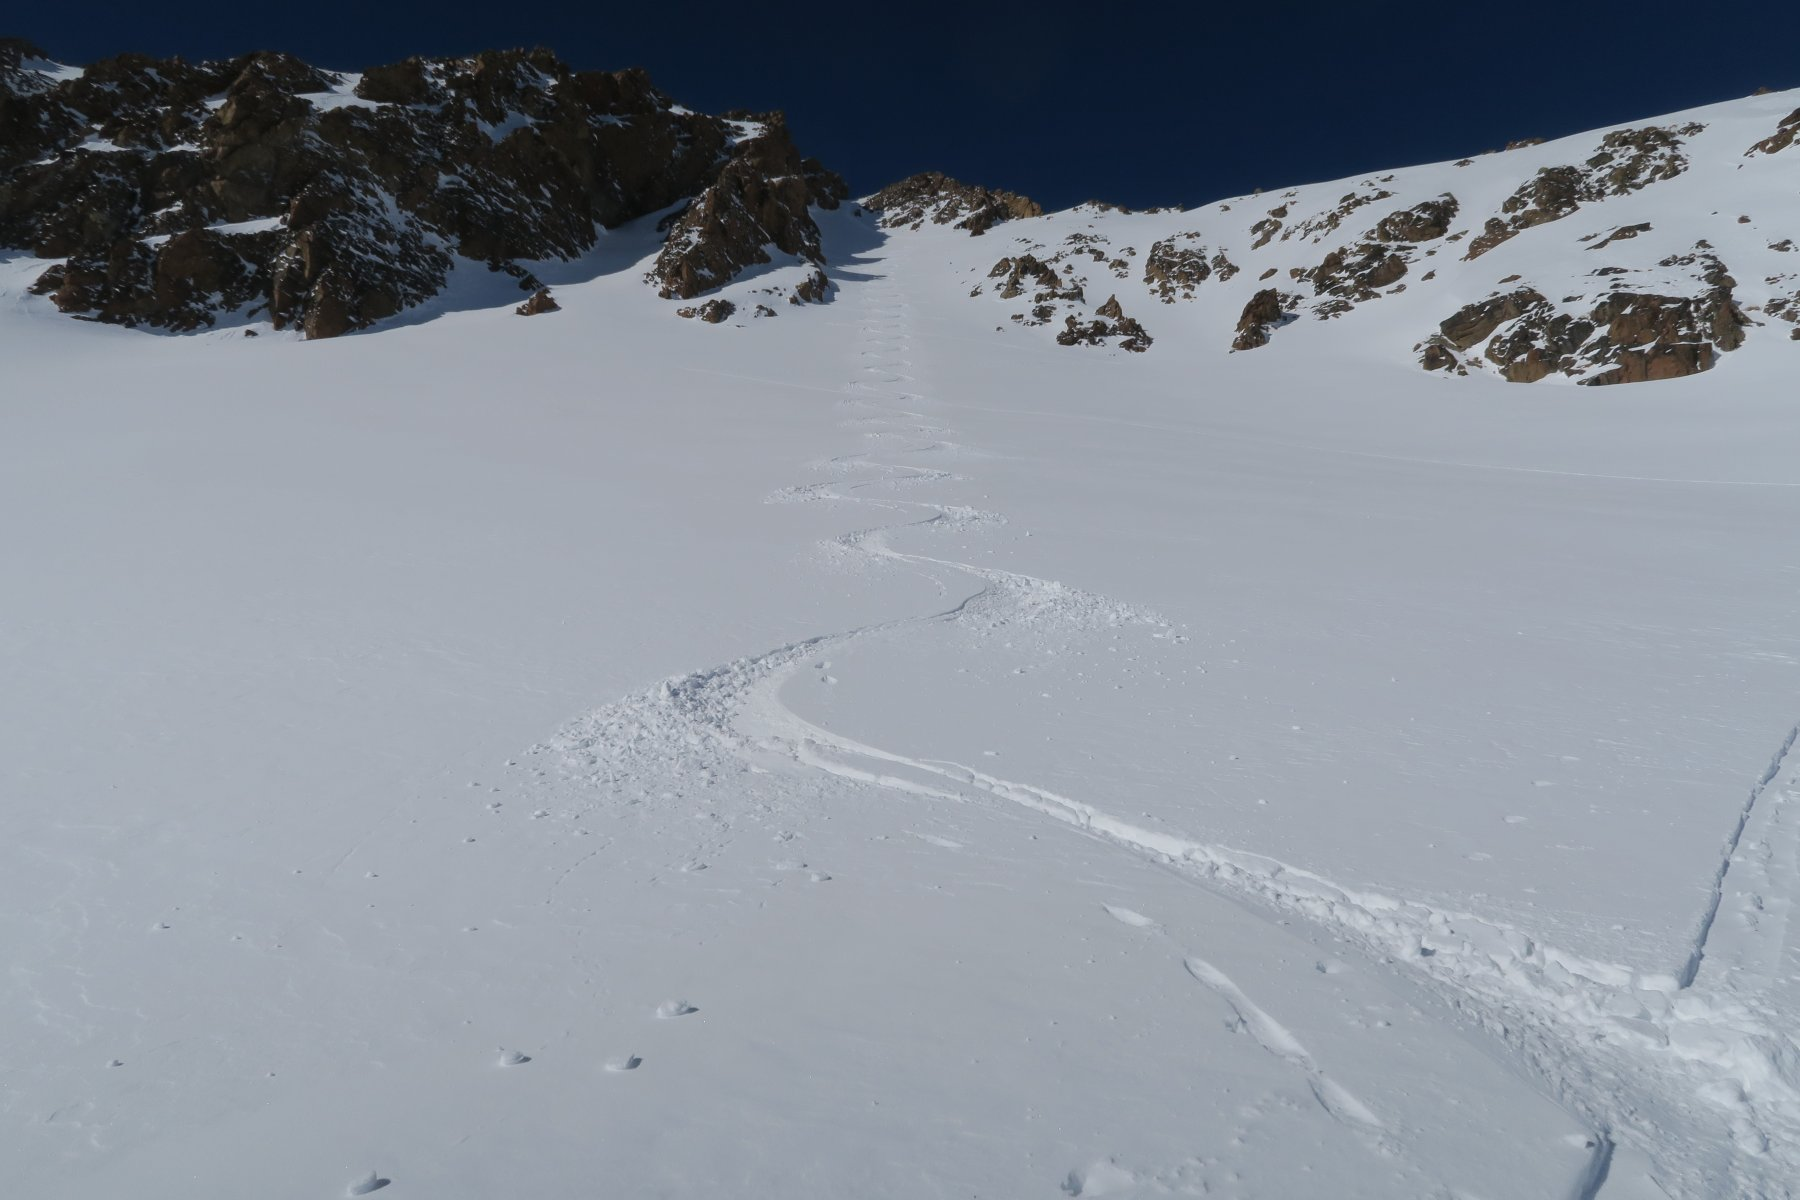 splendida neve nella prima parte